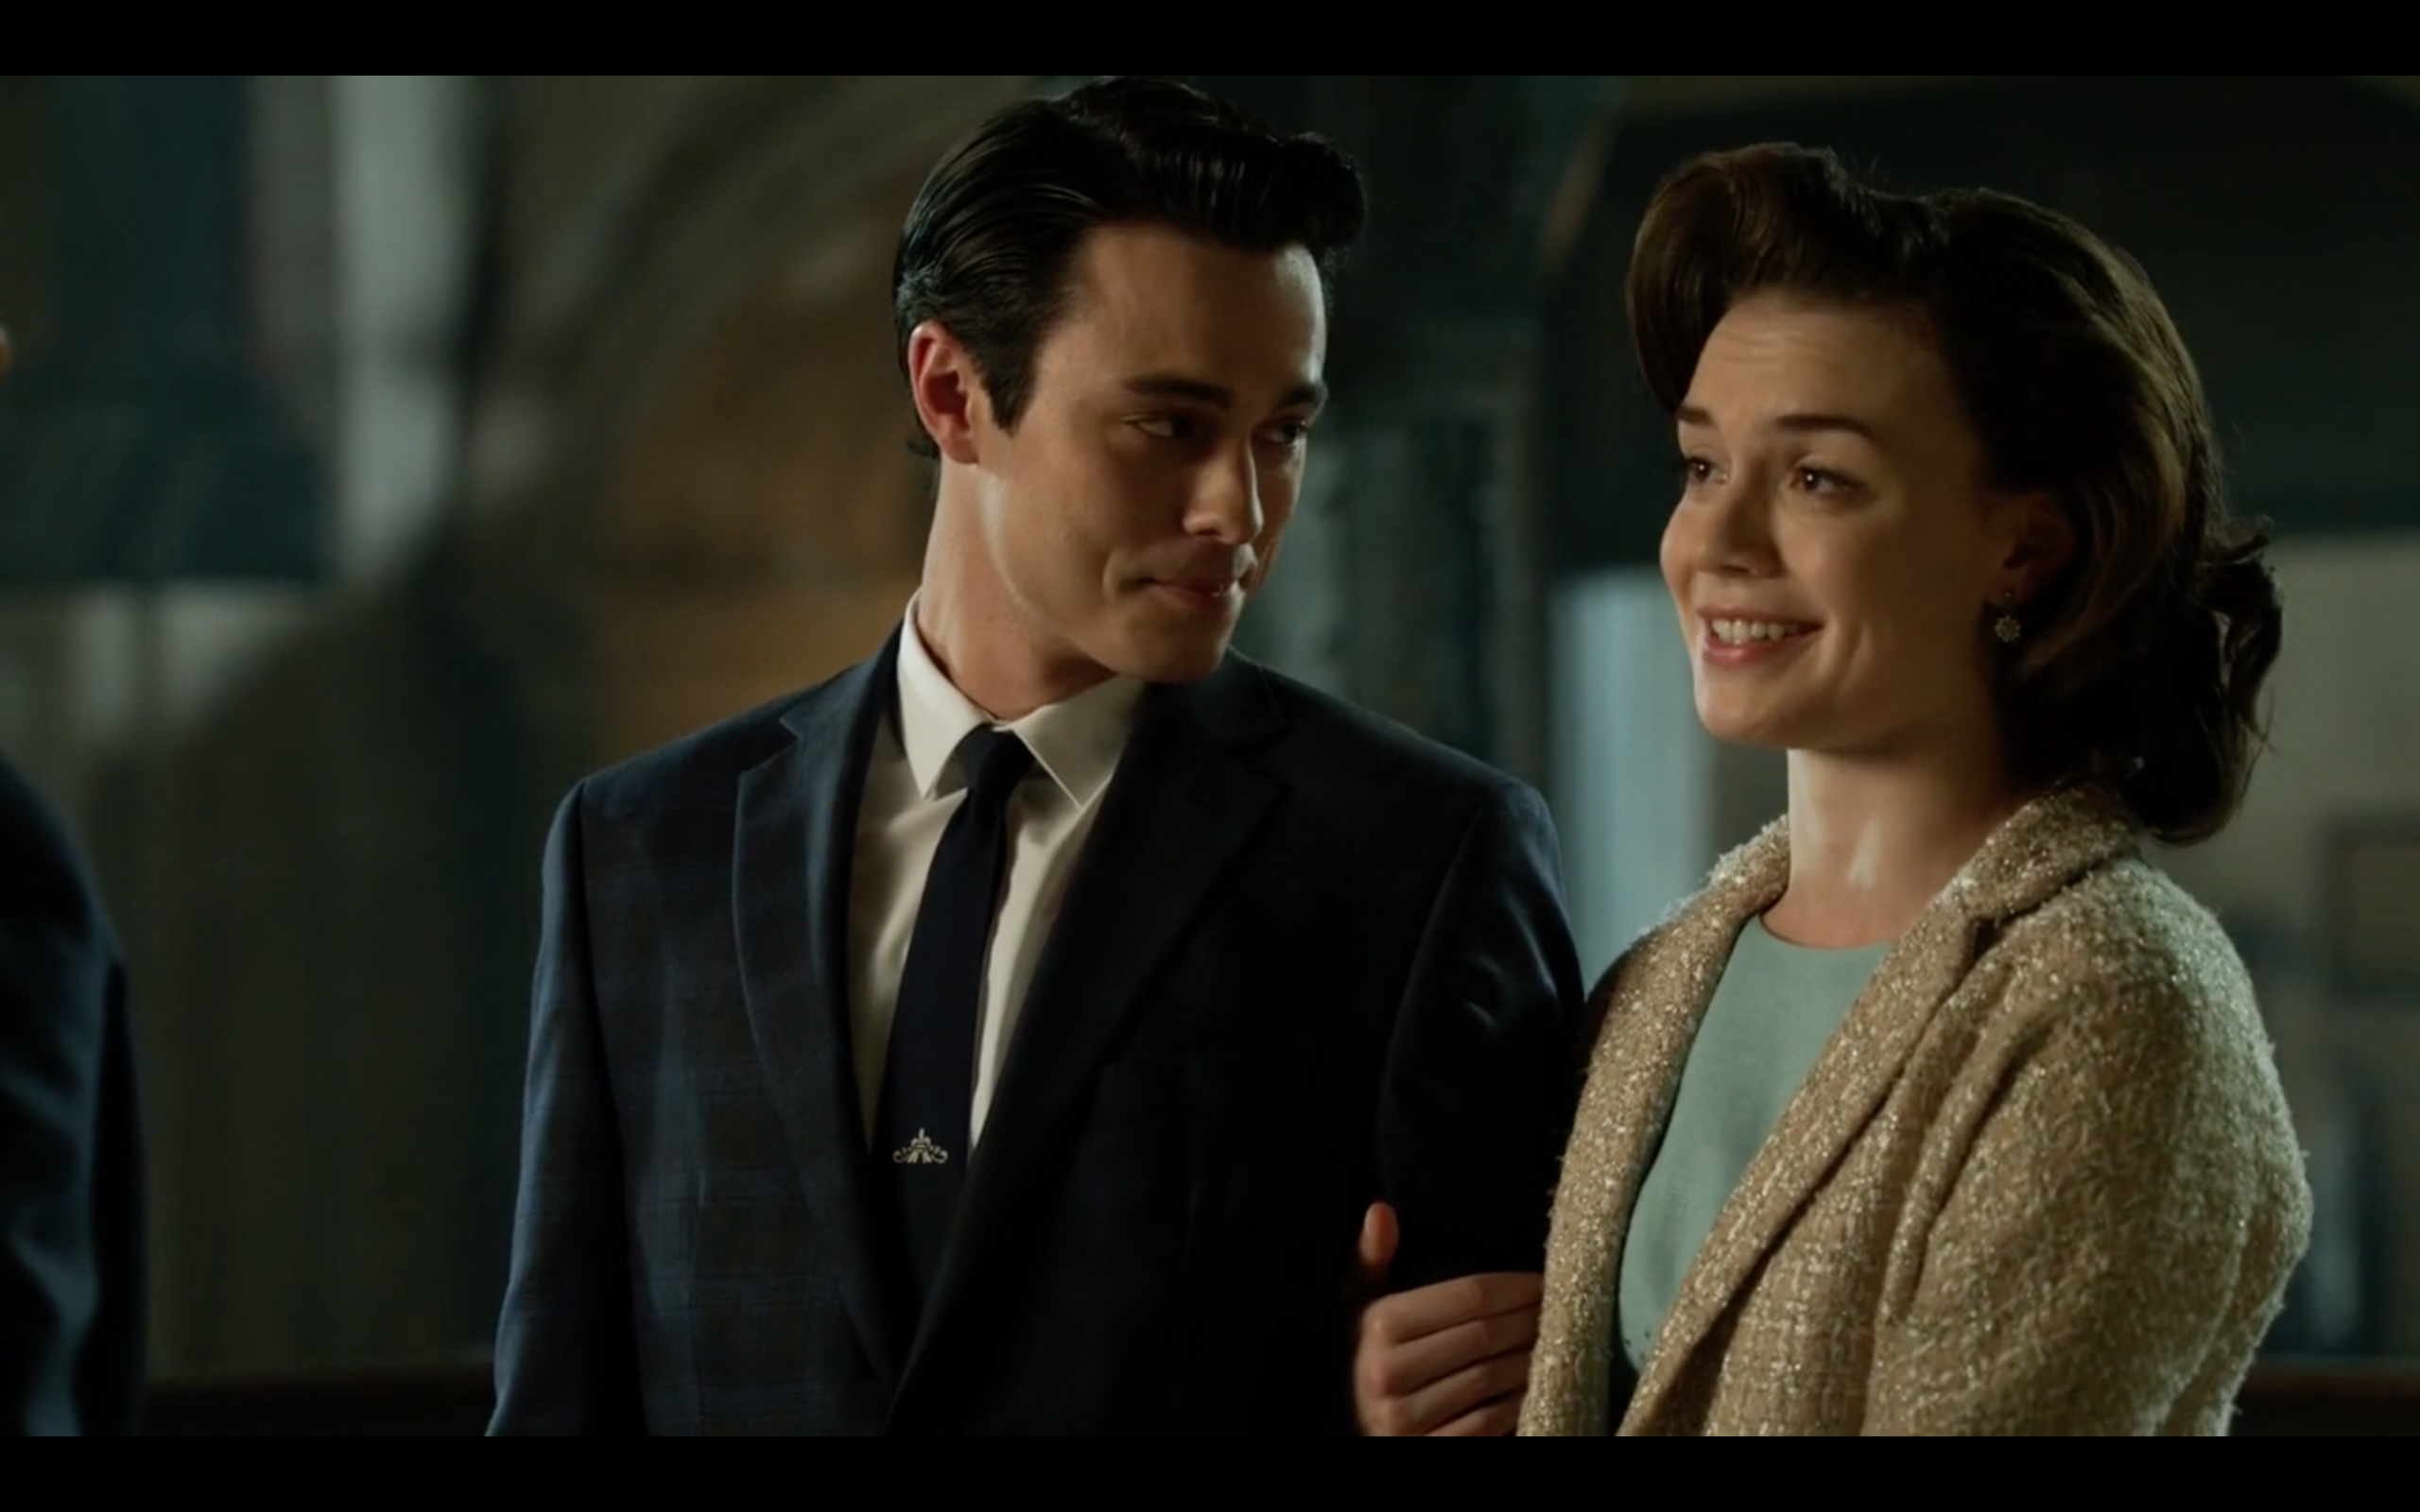 Robert Gorrie as John Grayson and Abbi Snee as Mary Lloyd in 'Gotham'